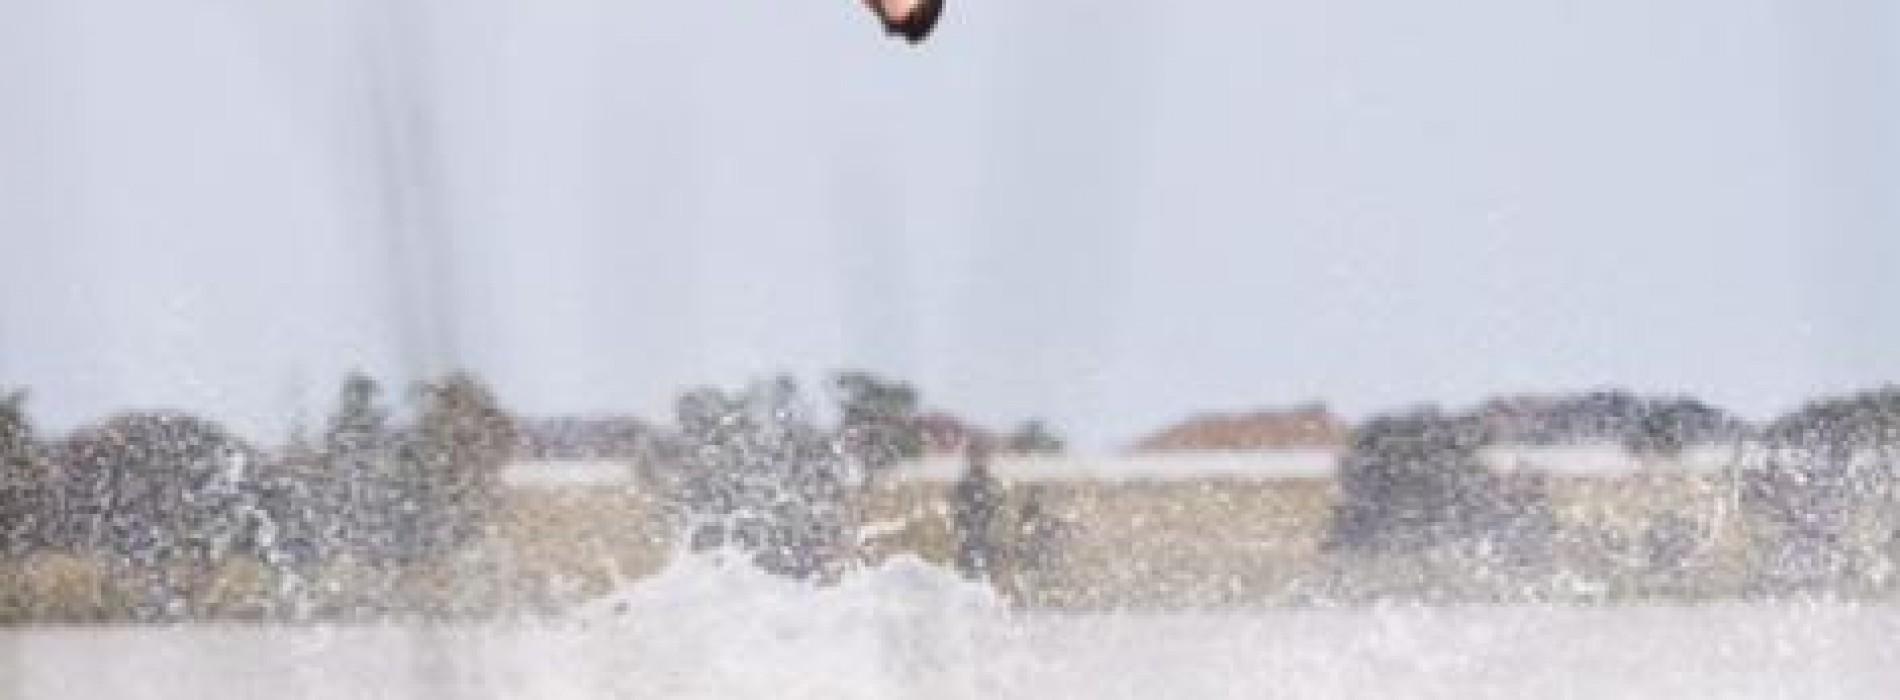 Irish Wakeboarder Takes Gold